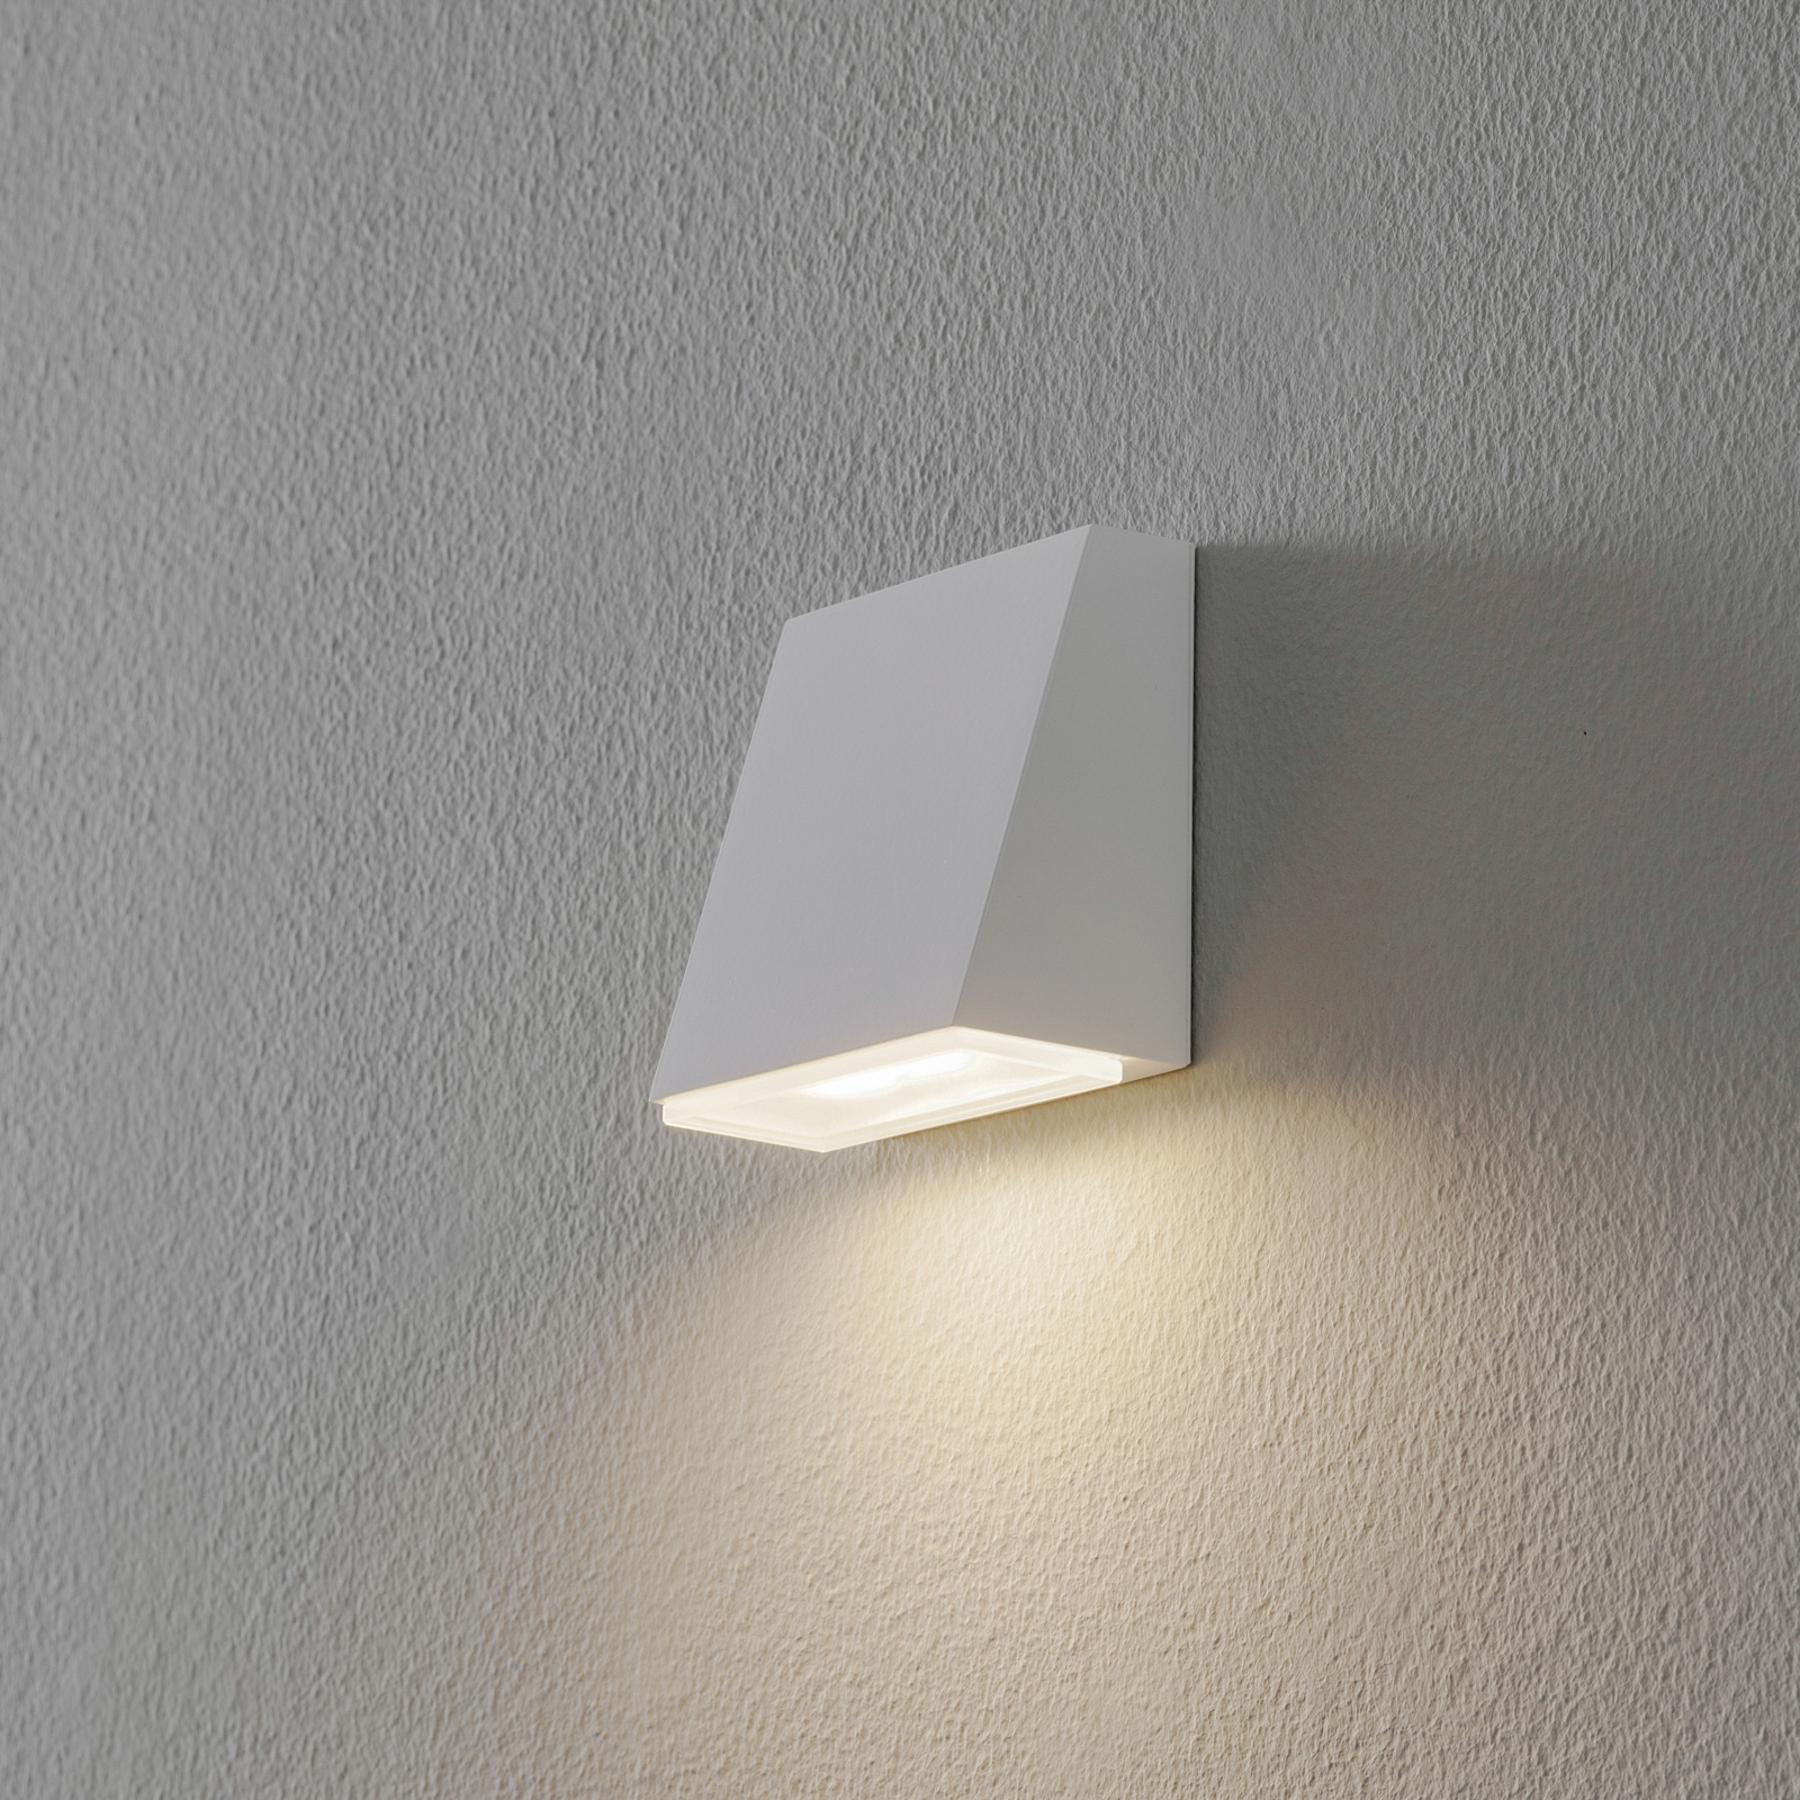 BEGA 78047 wandlamp trapeze 3.000K 9cm wit 255lm